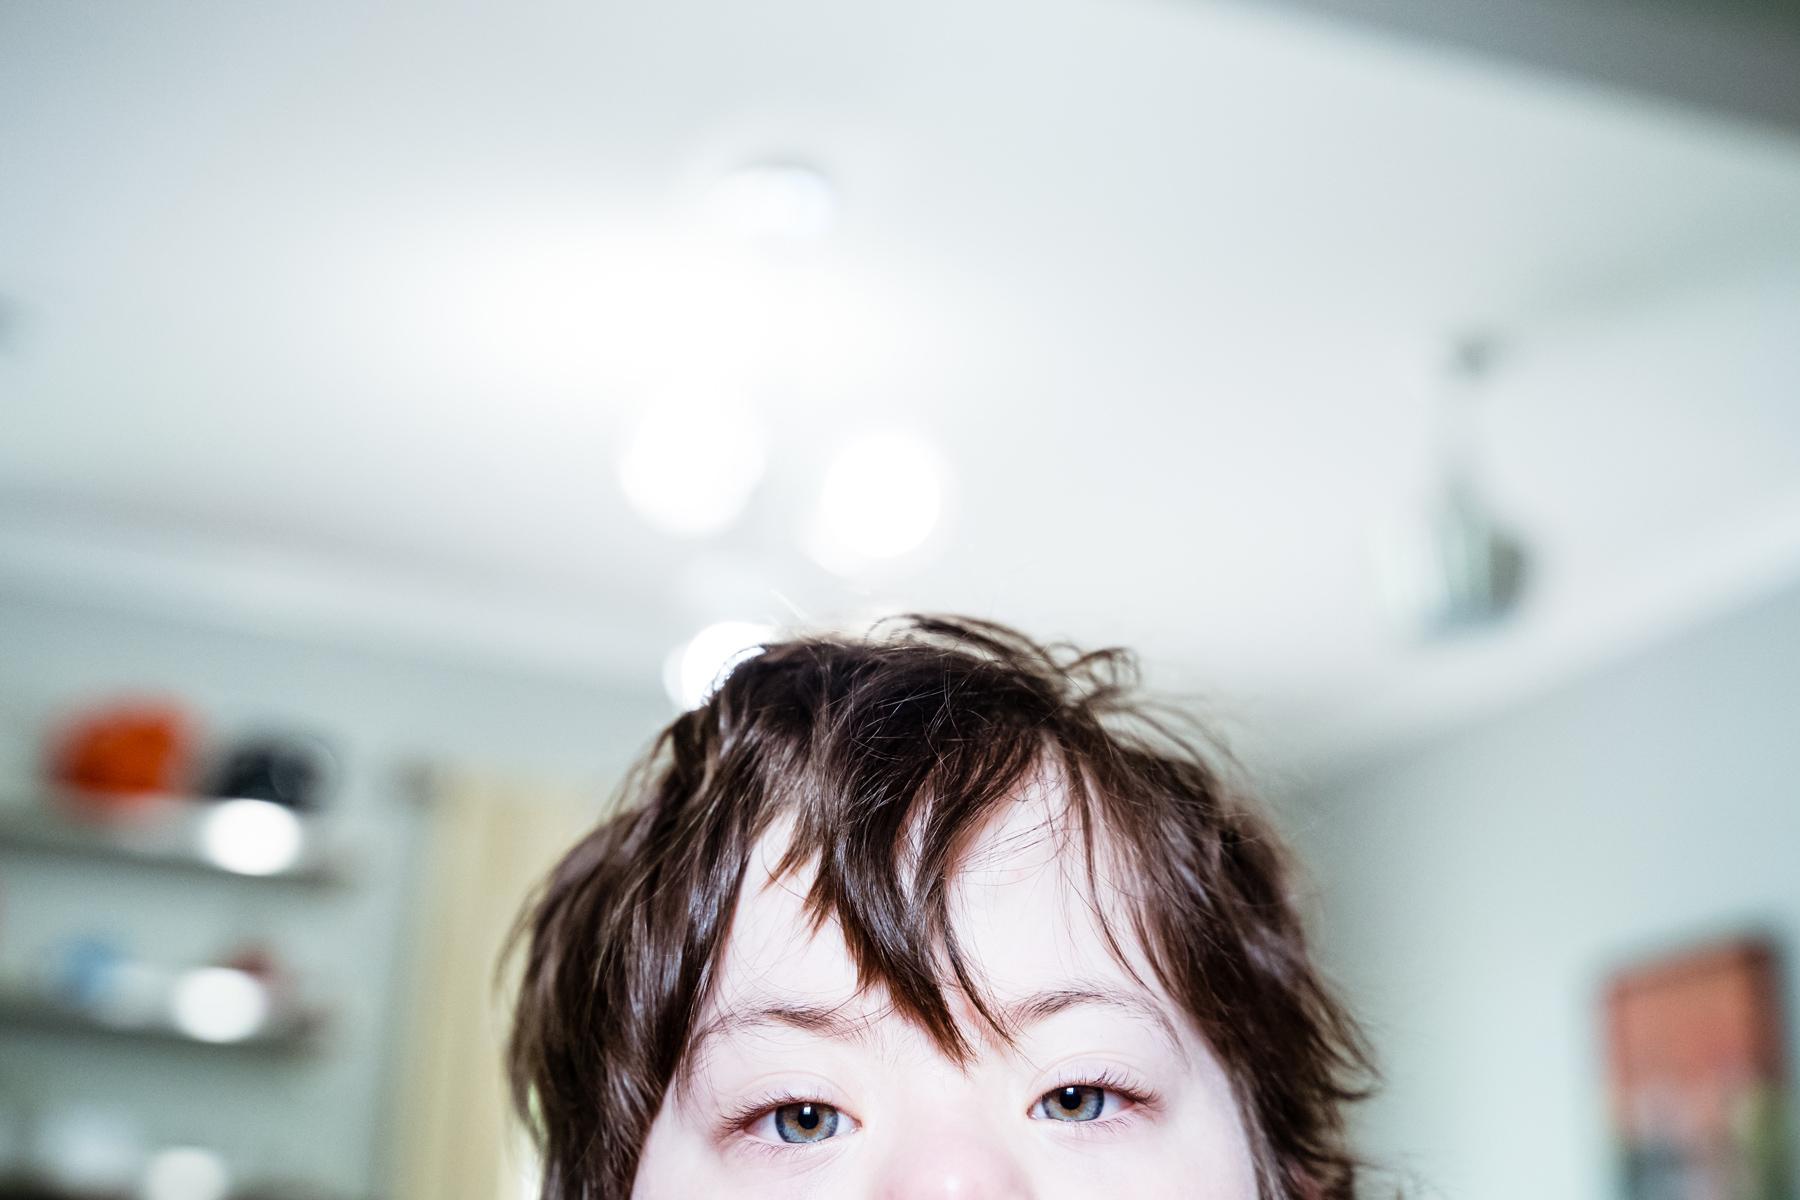 001-kandise-brown-fredericton-photographer-rowan2020